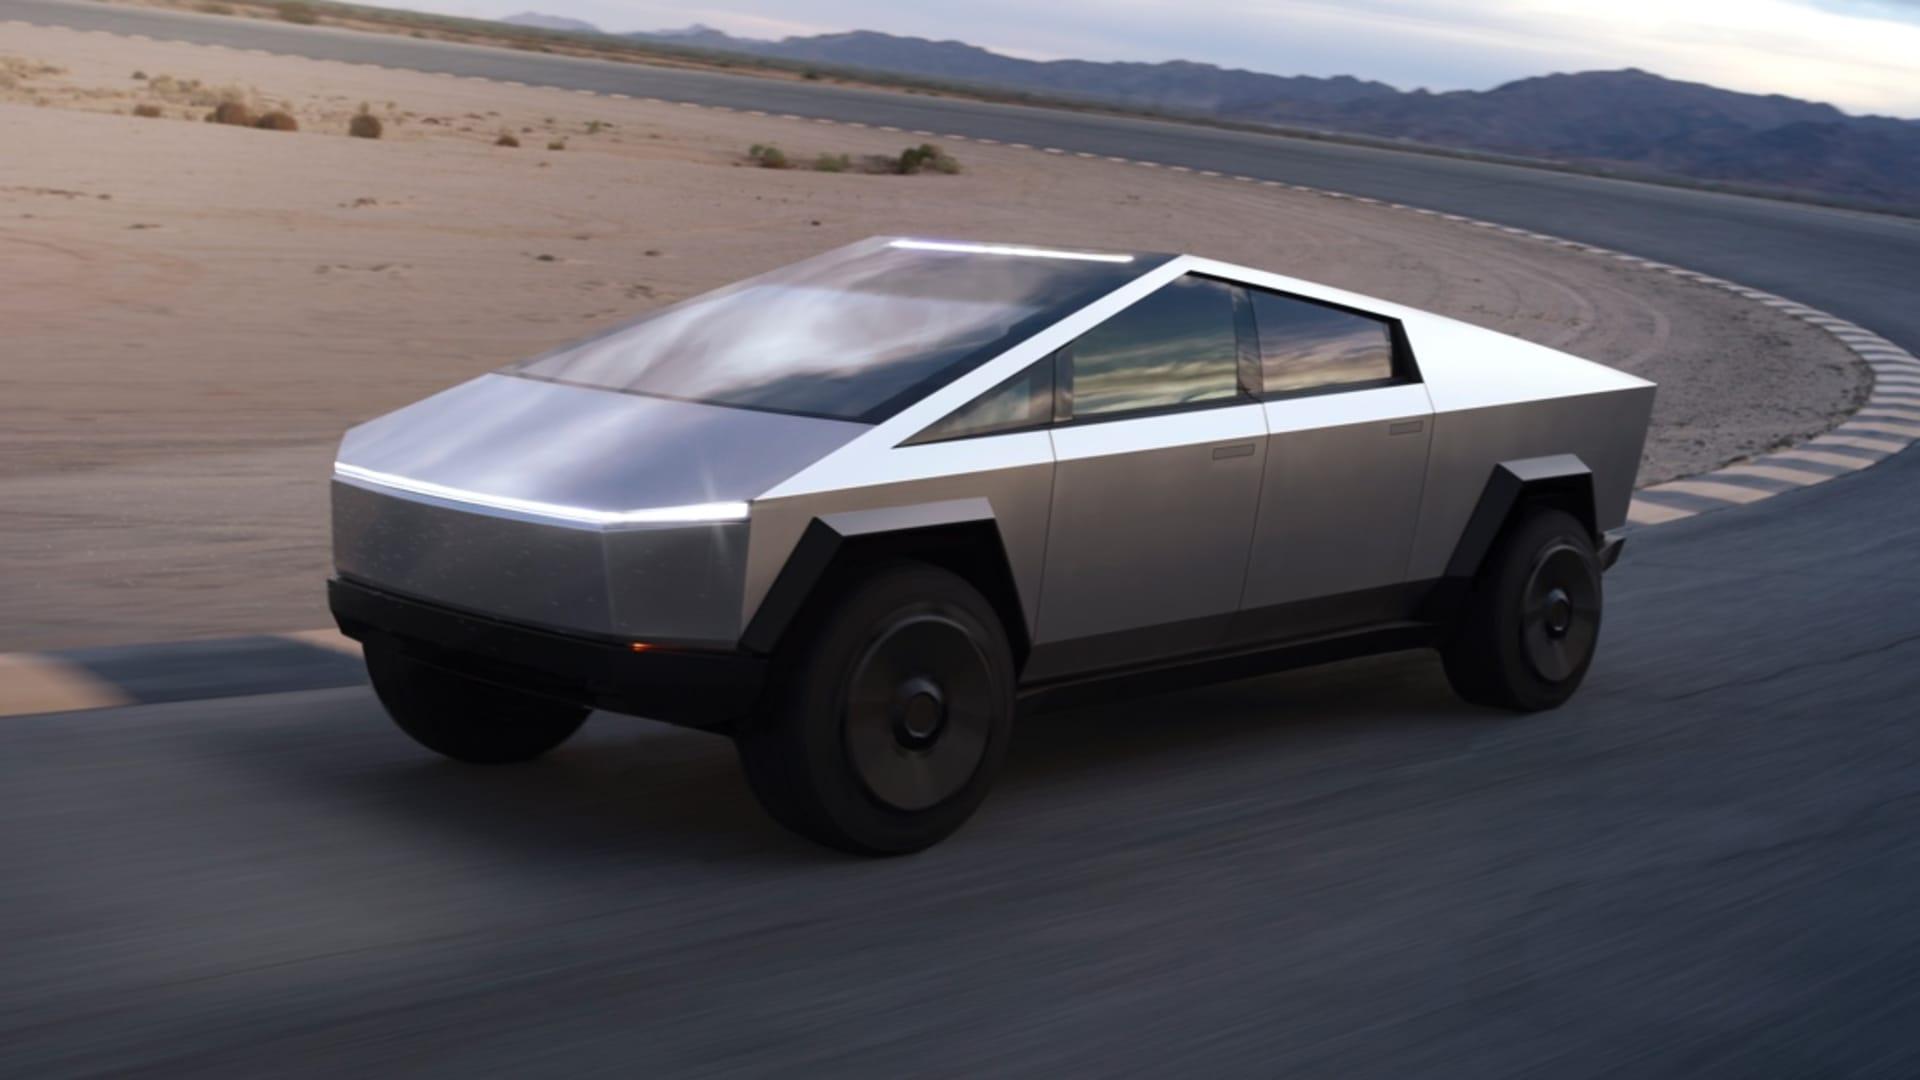 A promotional shot of Tesla's Cybertruck.